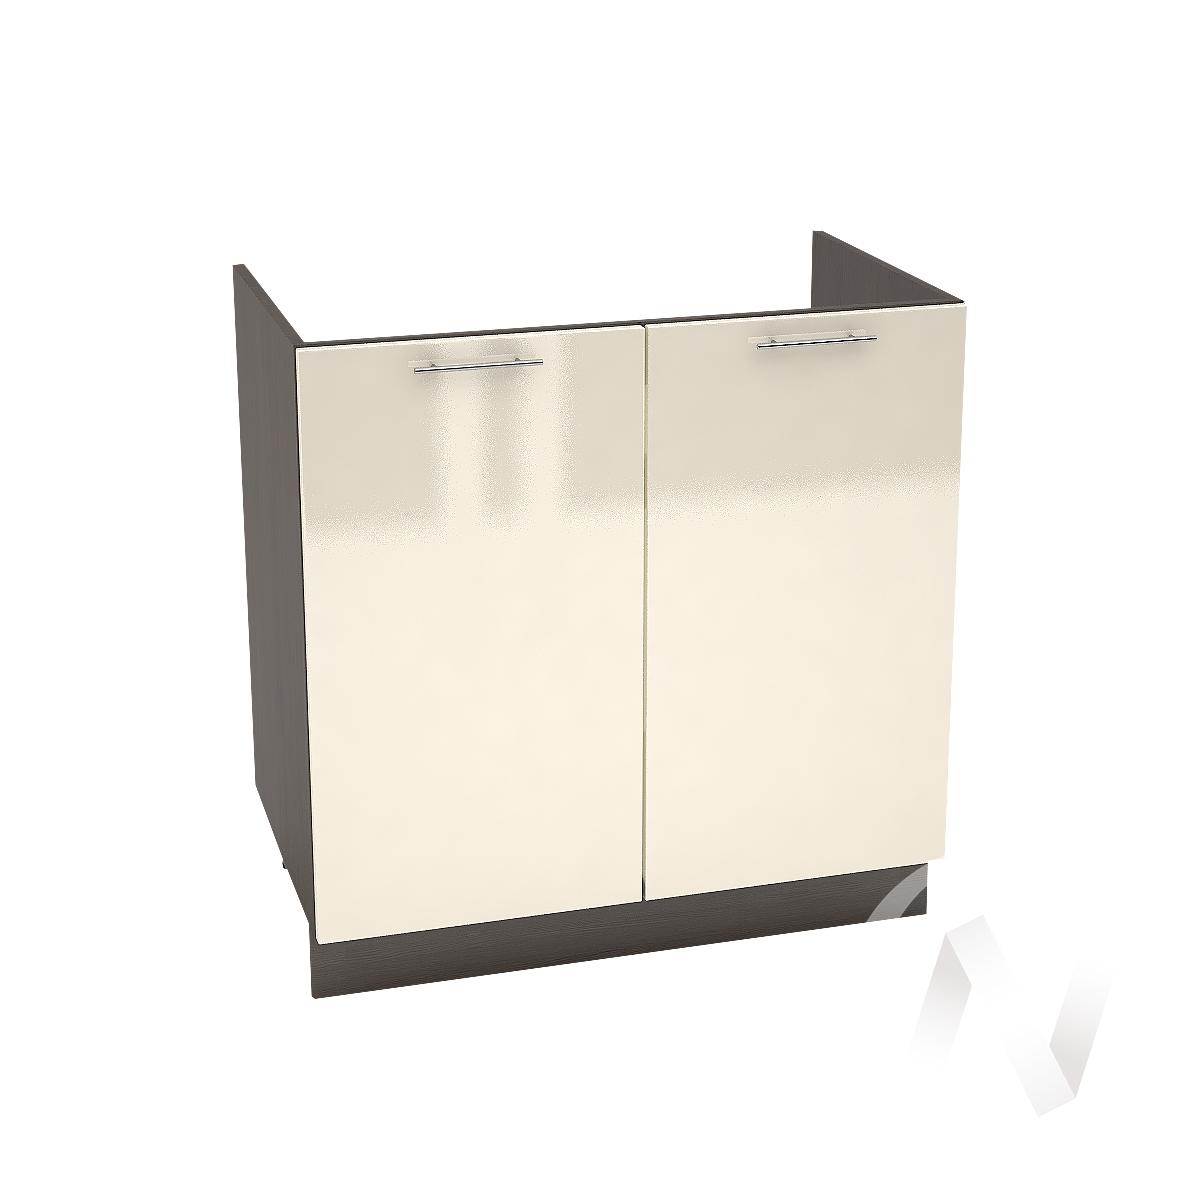 "Кухня ""Валерия-М"": Шкаф нижний под мойку 800, ШНМ 800 (Ваниль глянец/корпус венге)"